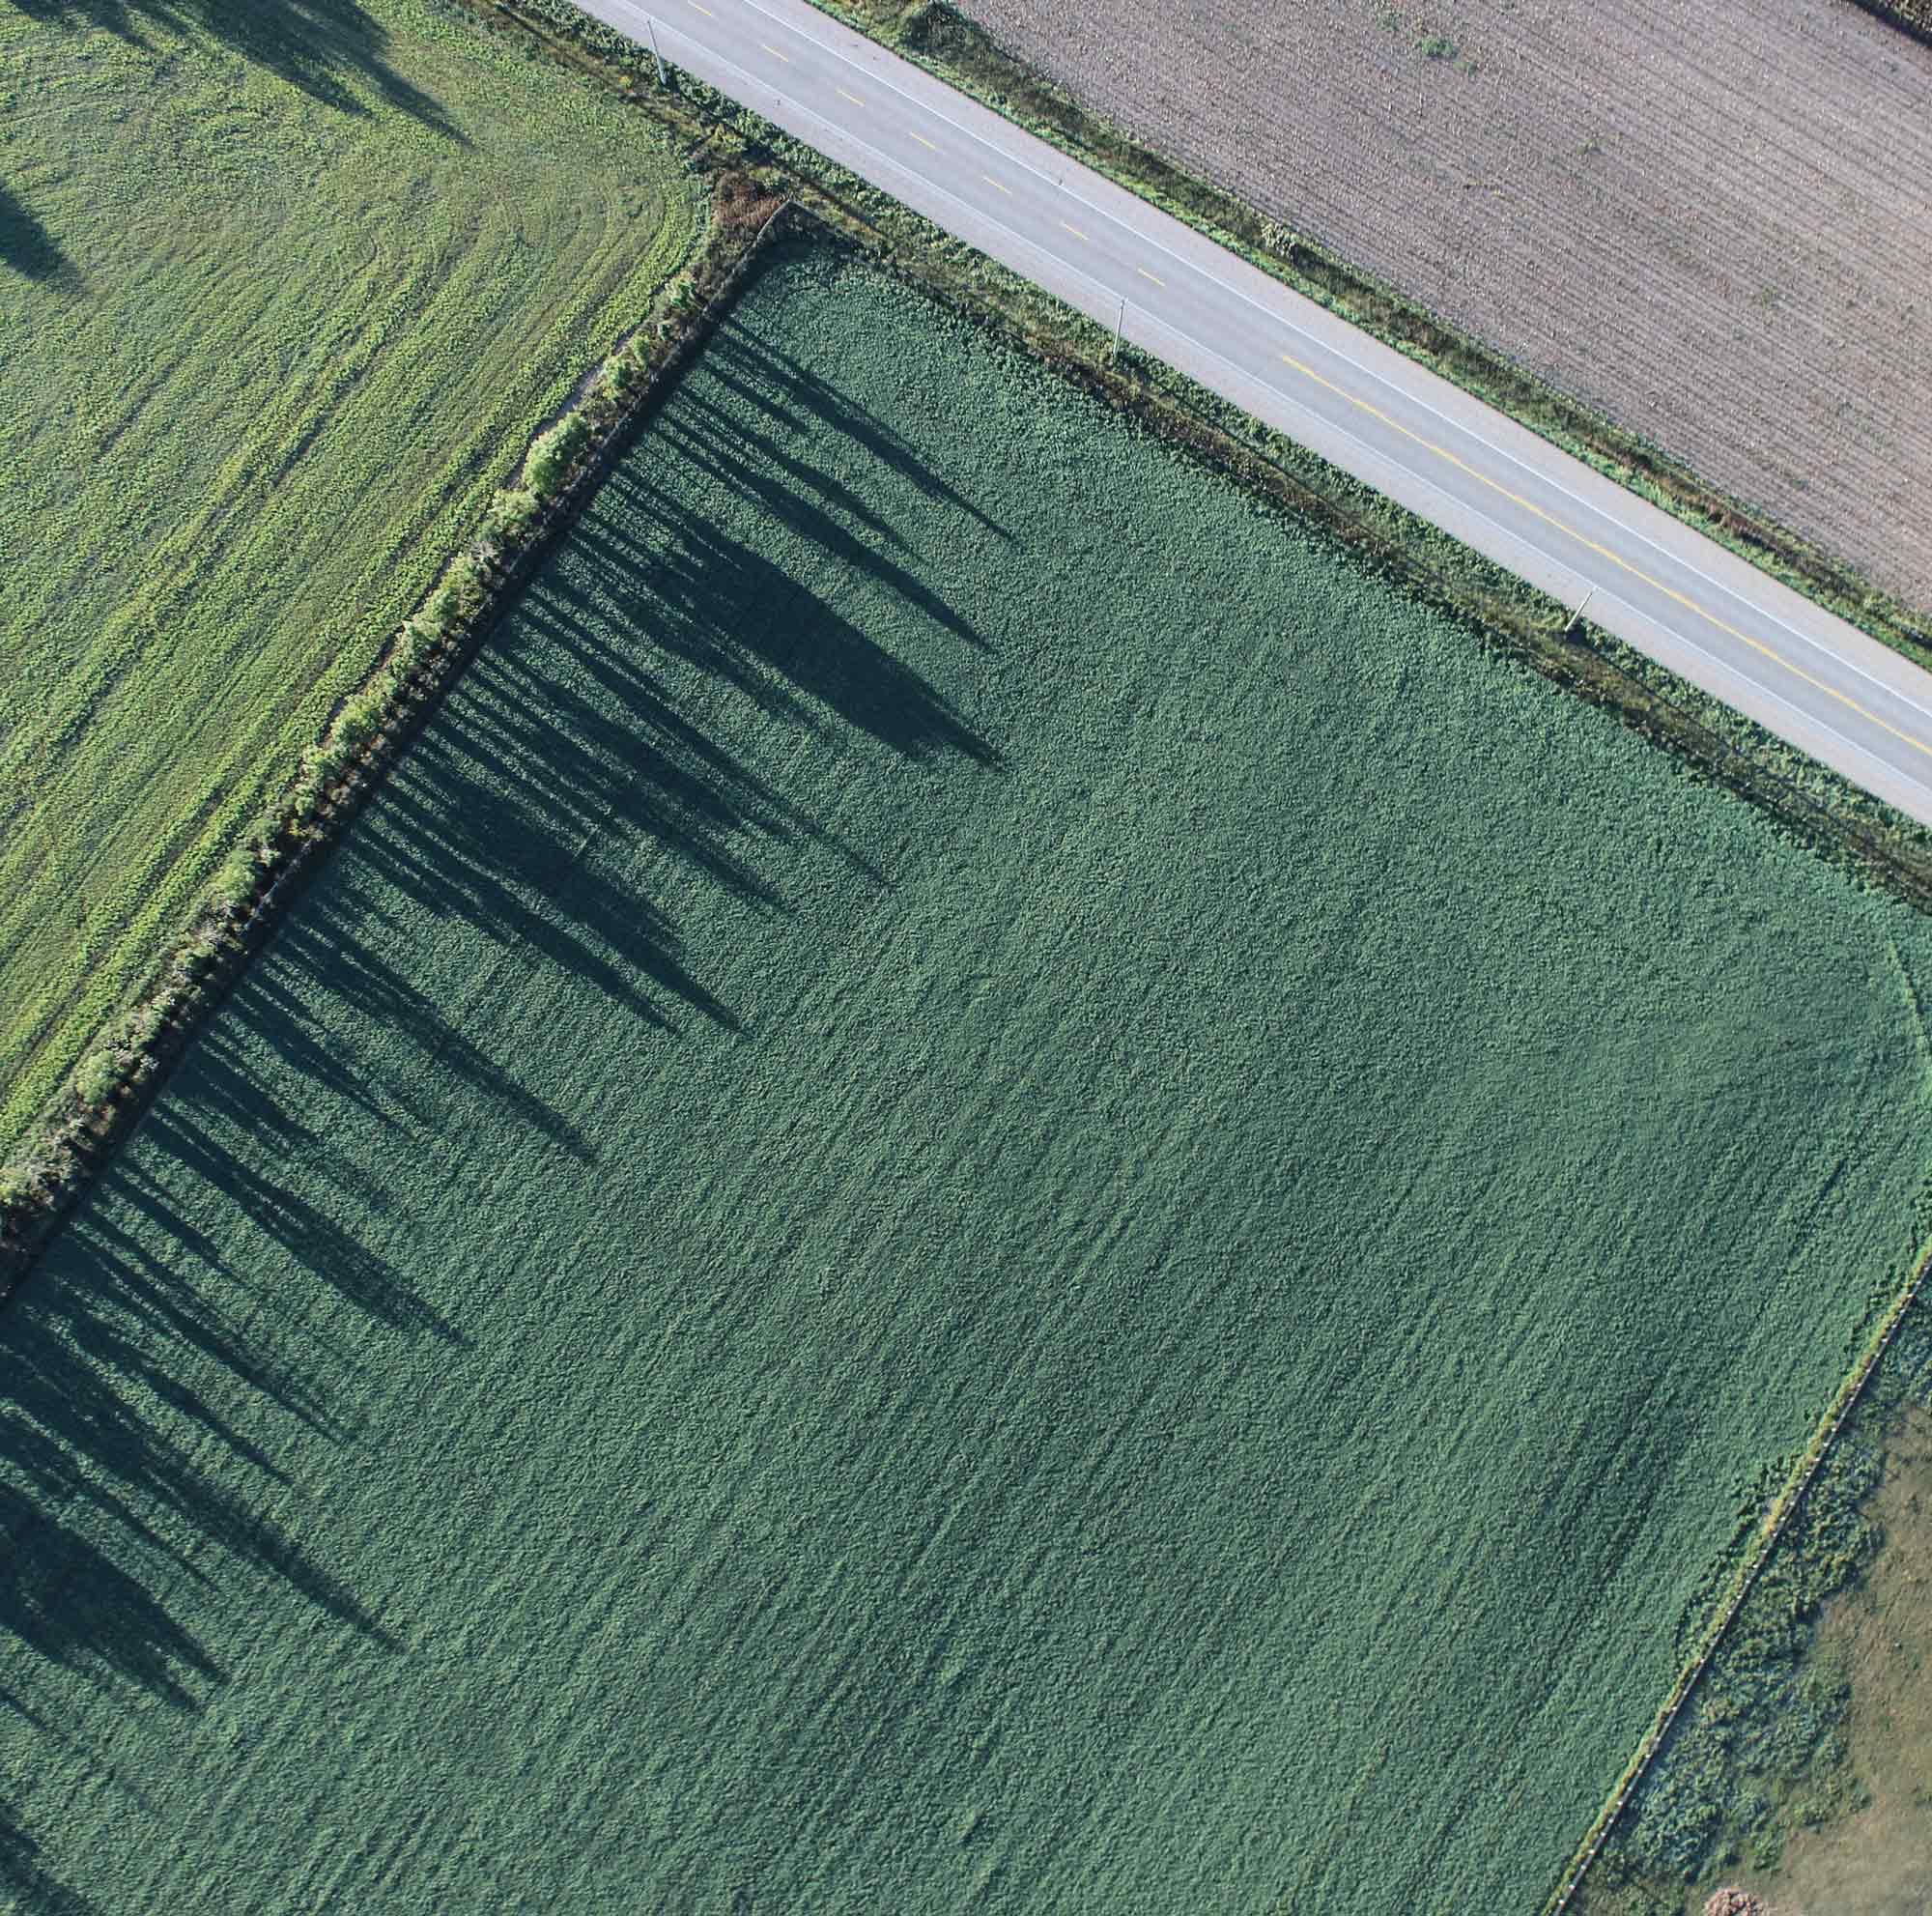 Una vista aérea de un campo. Una carretera atraviesa la esquina superior derecha.